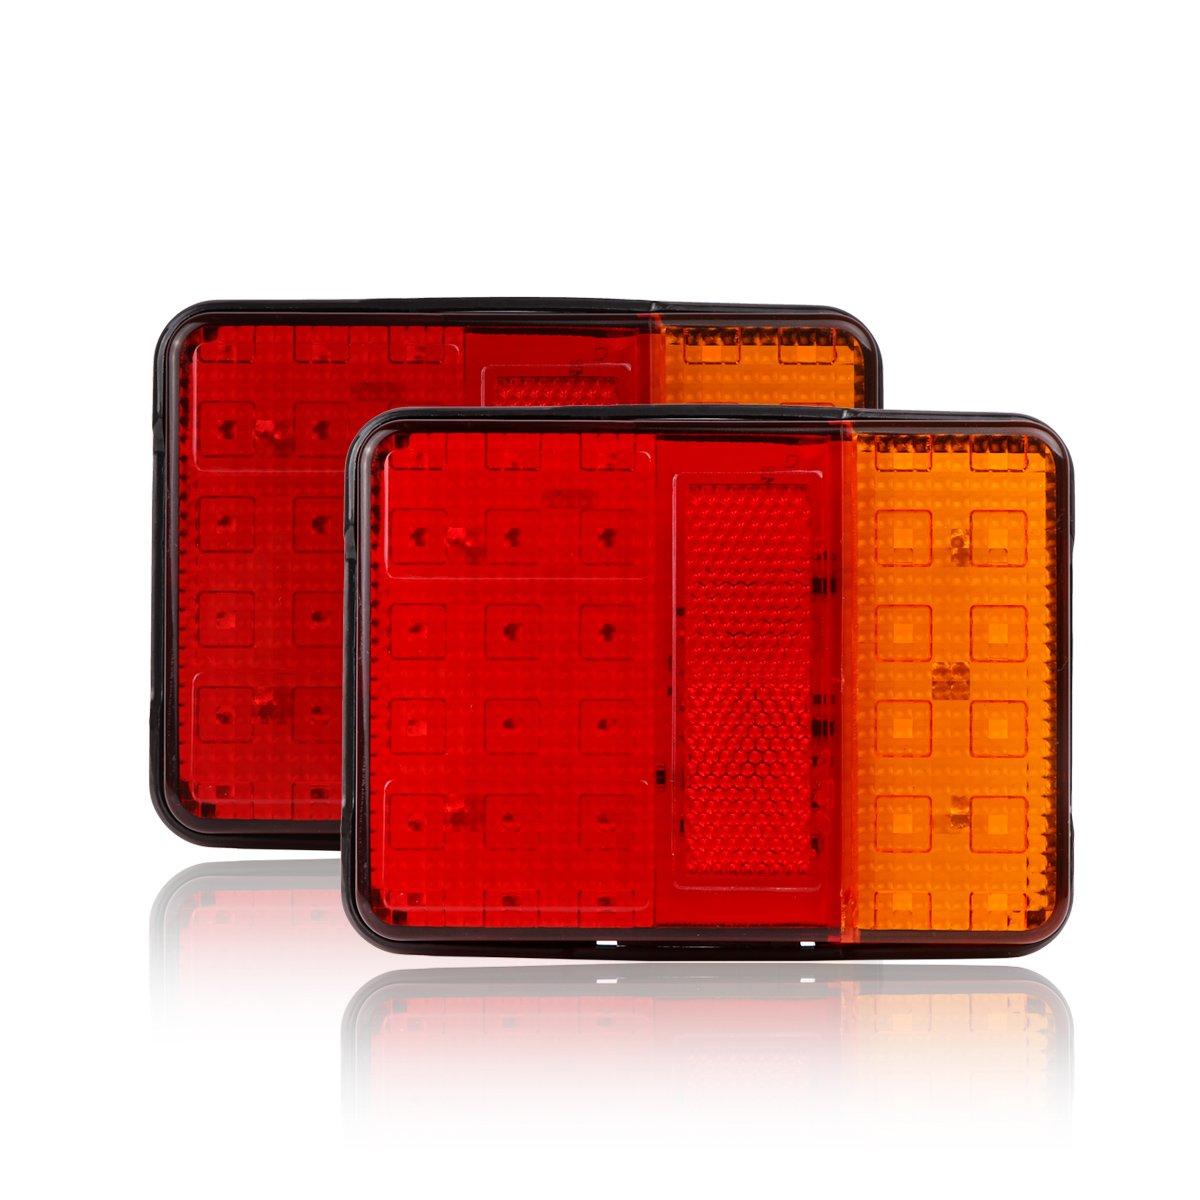 30 luces LED traseras de freno e indicadores de Abedoe, 12 V, para remolque, camió n, volquete, furgoneta y caravana 12V camión